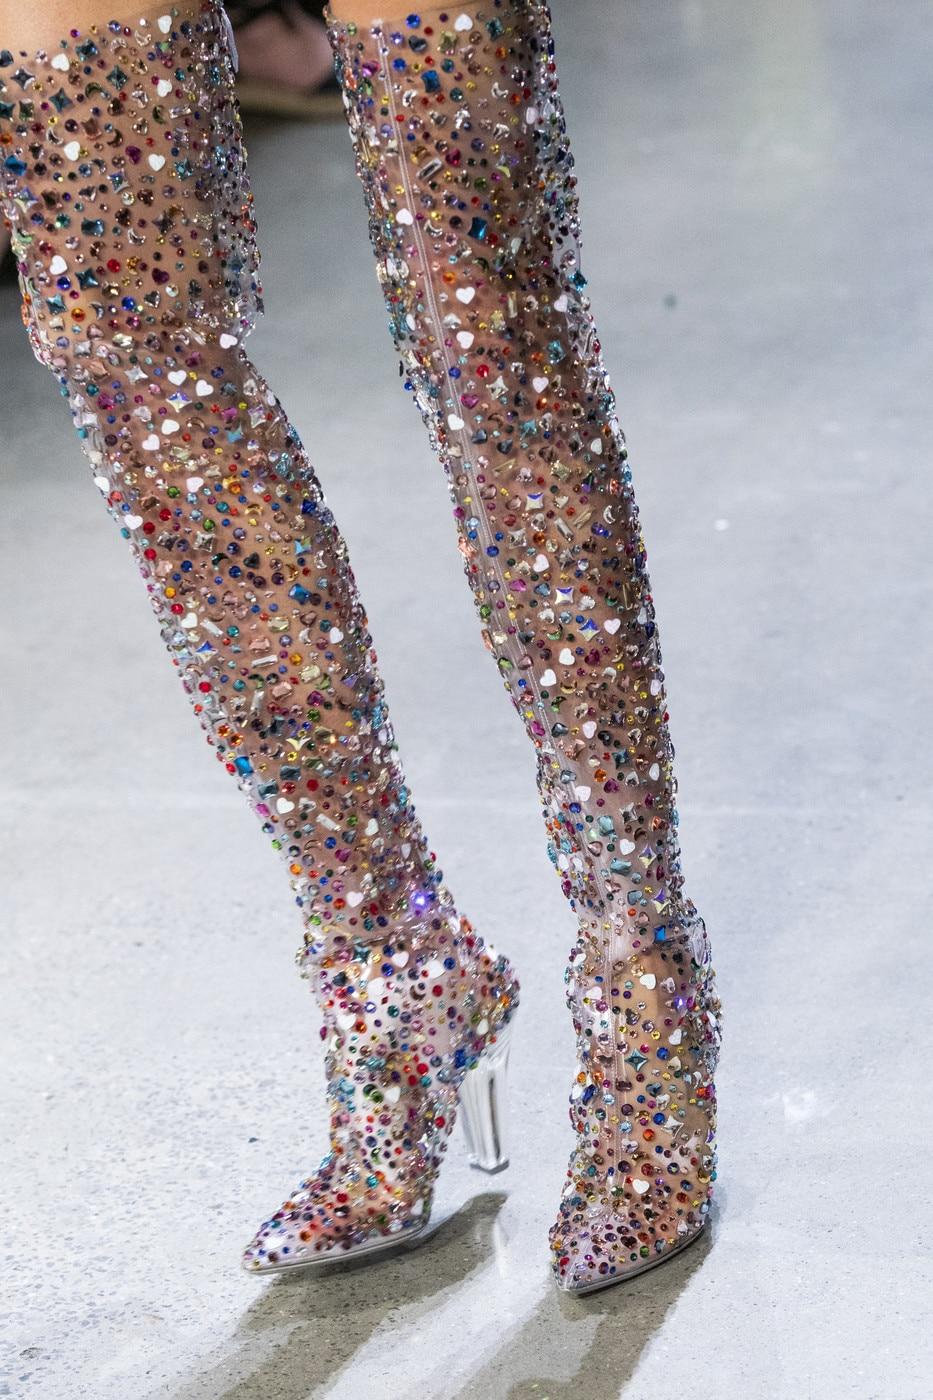 Abesire 2019 Nieuwste Vrouwen Multi Kleur Glitter Vierkante Hoge Hakken Over de knie Laarzen Dames Puntschoen Side zipper Runway Schoenen